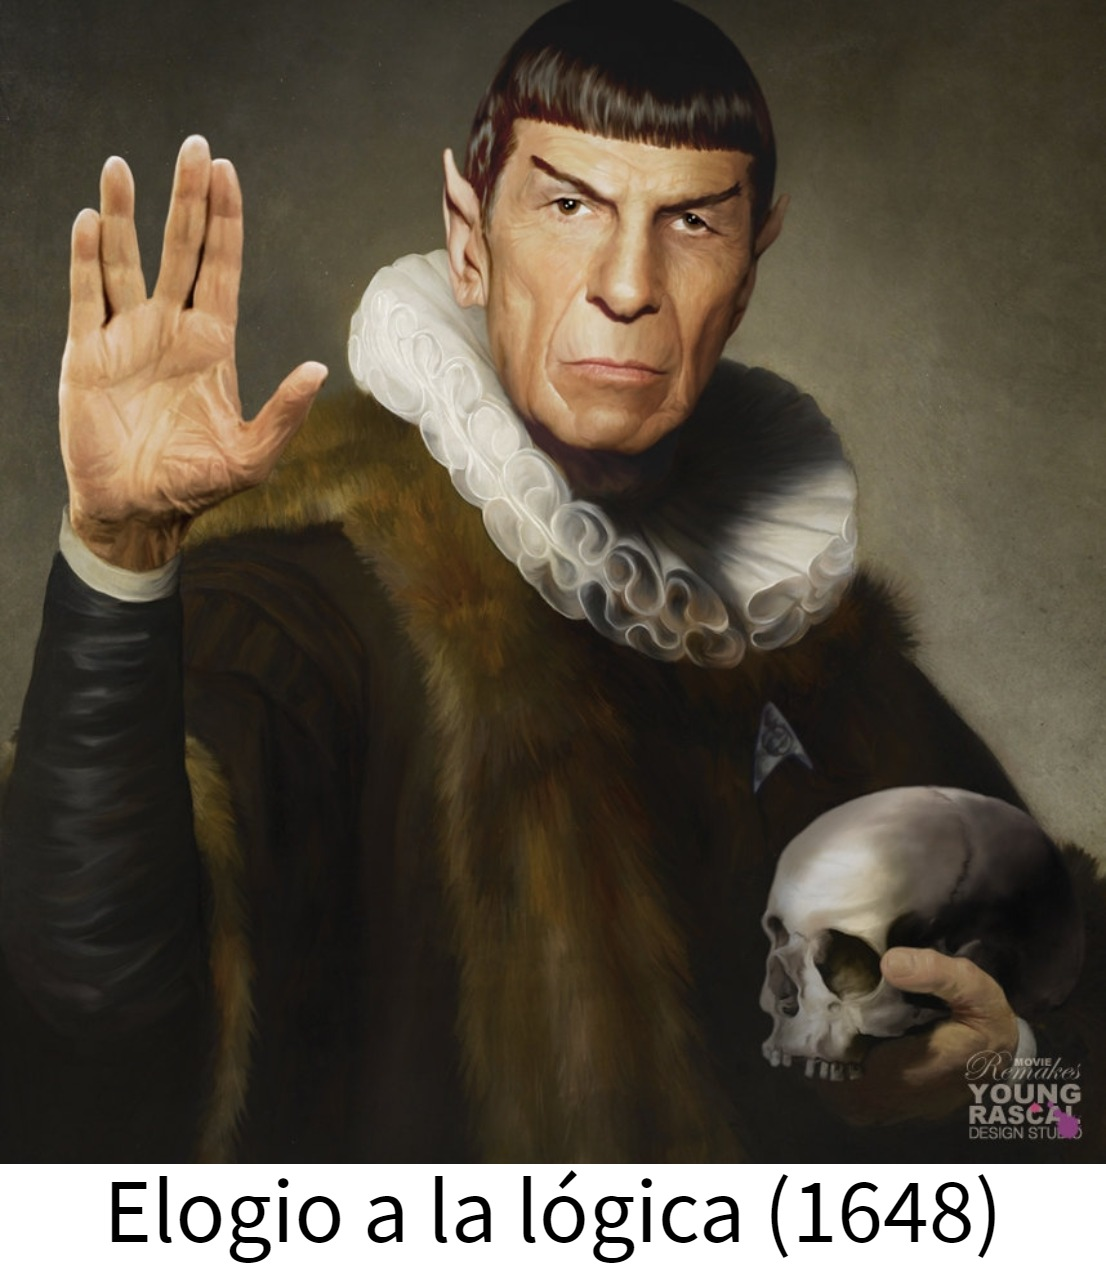 Meme – Diseño – Spock pintura barroca Elogio a la Lógica